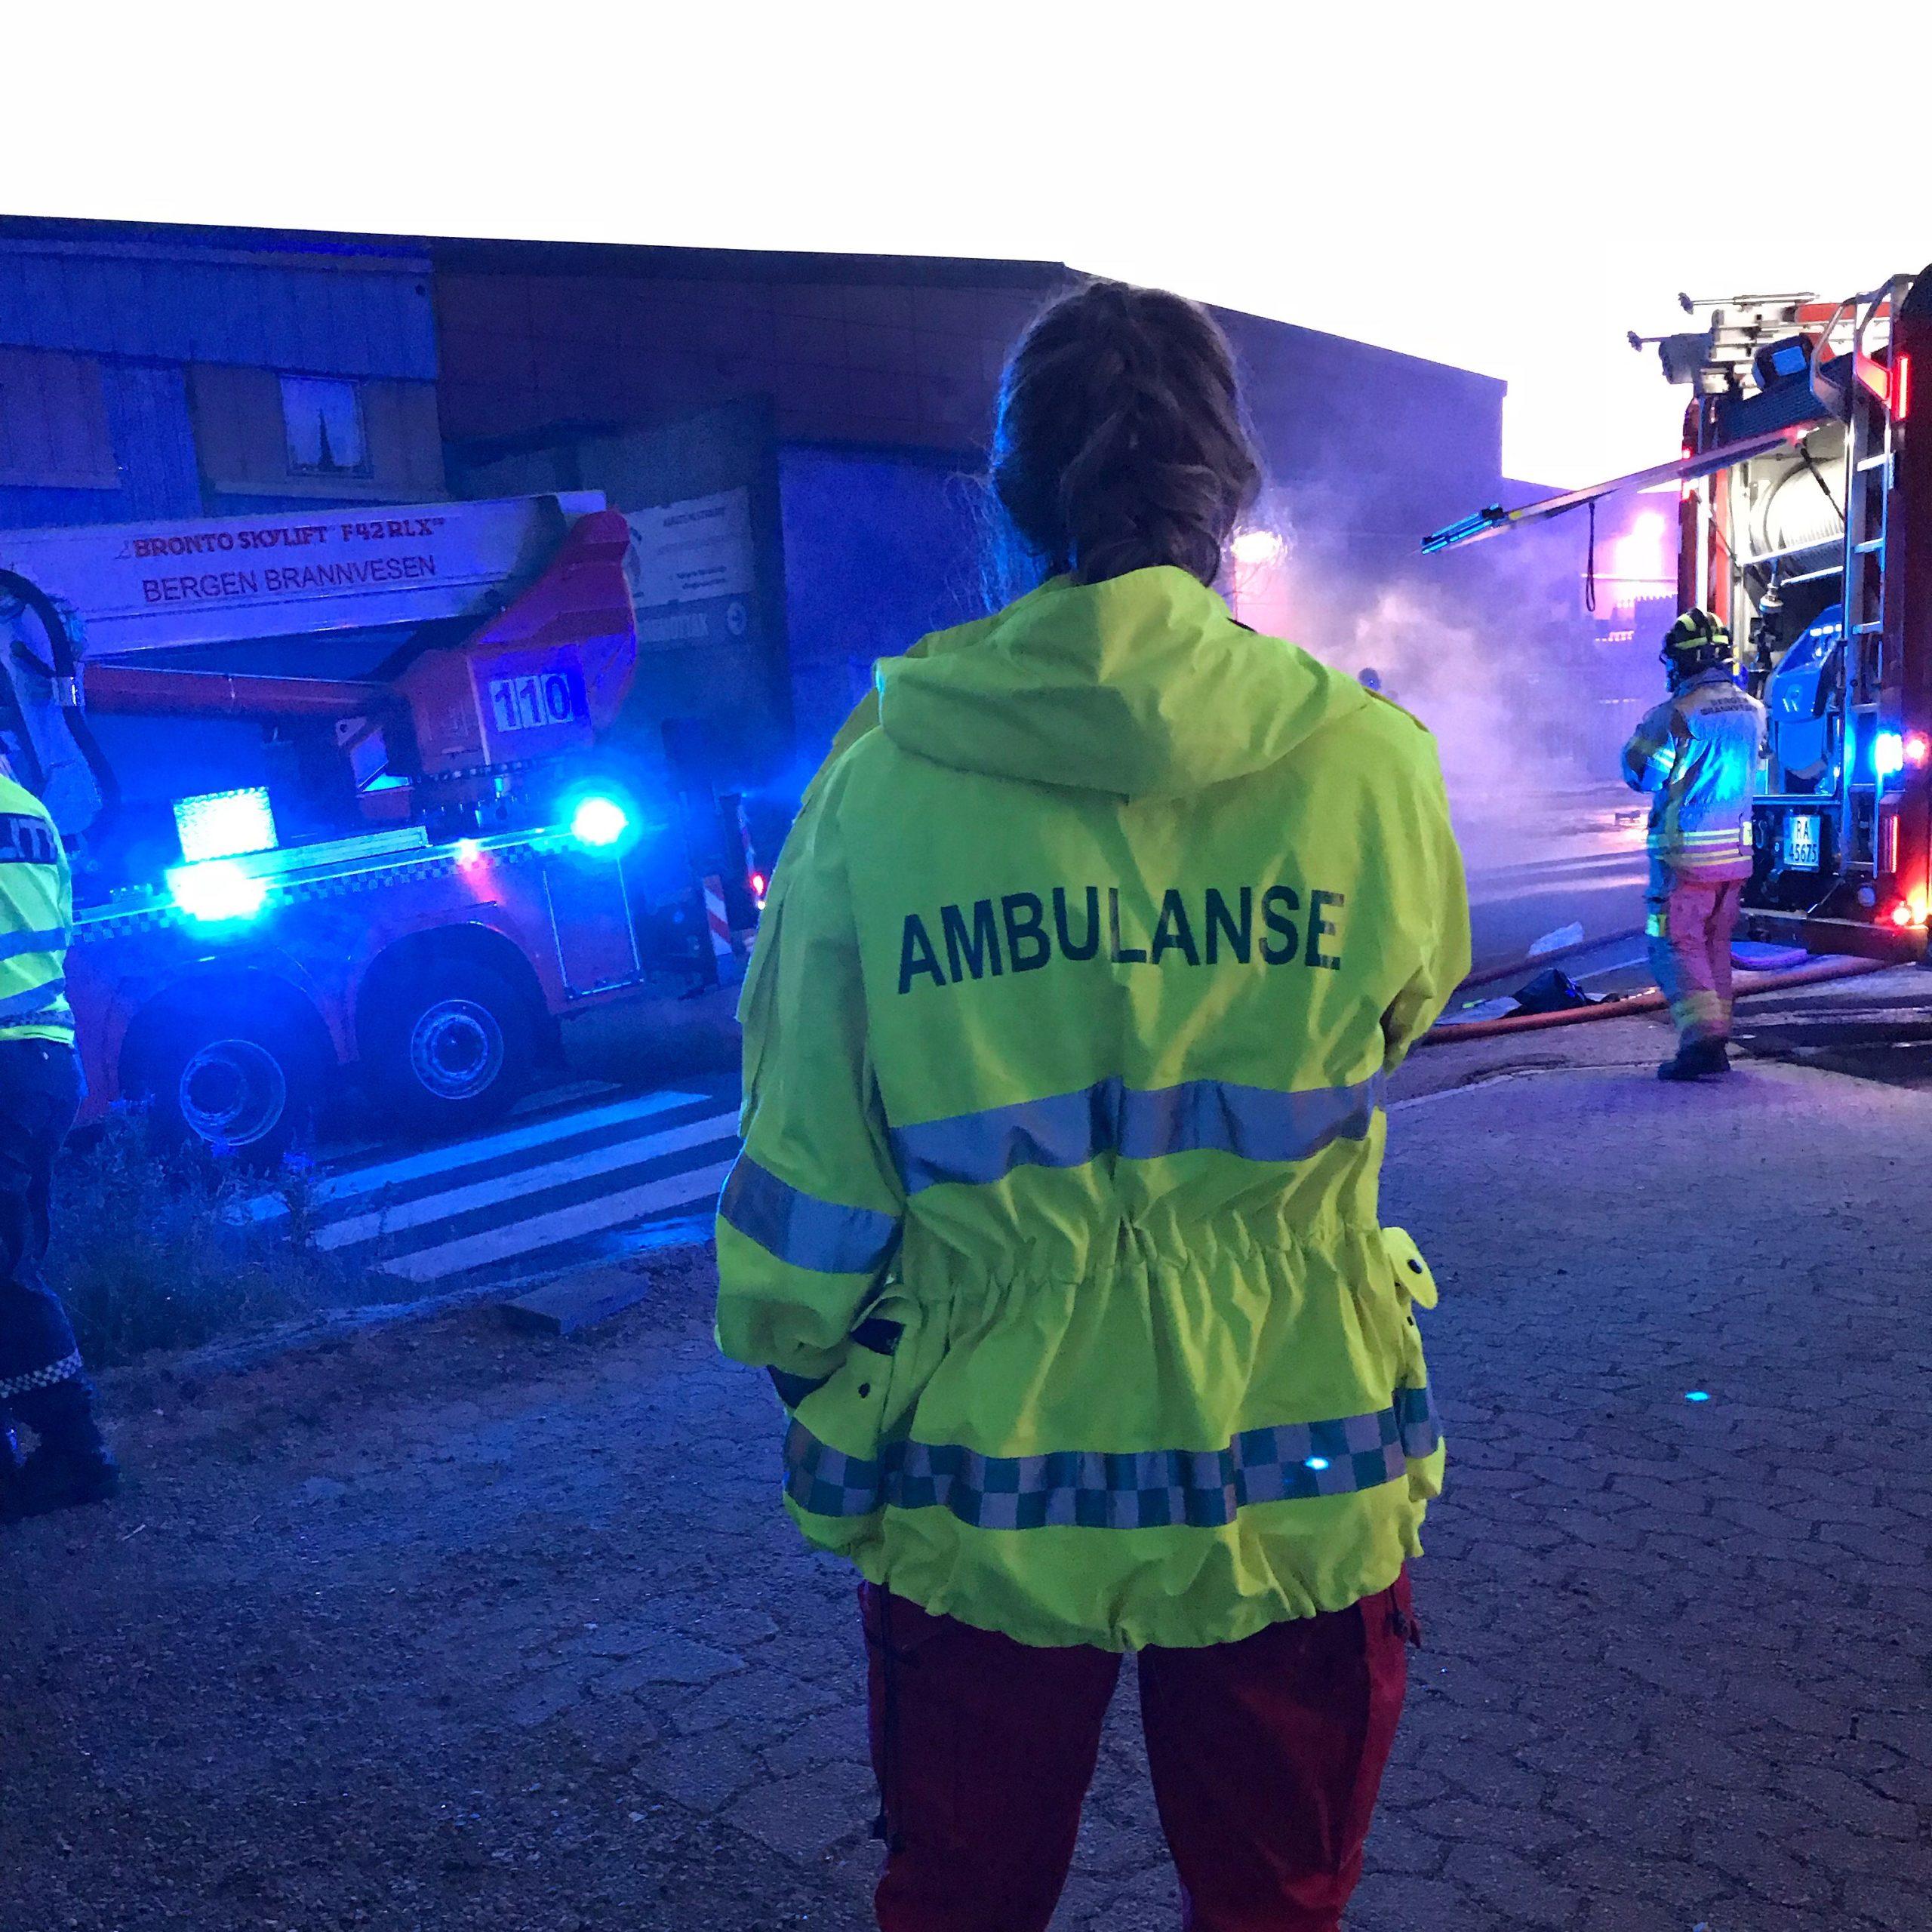 Tine-Tangerud-Sykepleier-i-ambulansen-cingulum-2